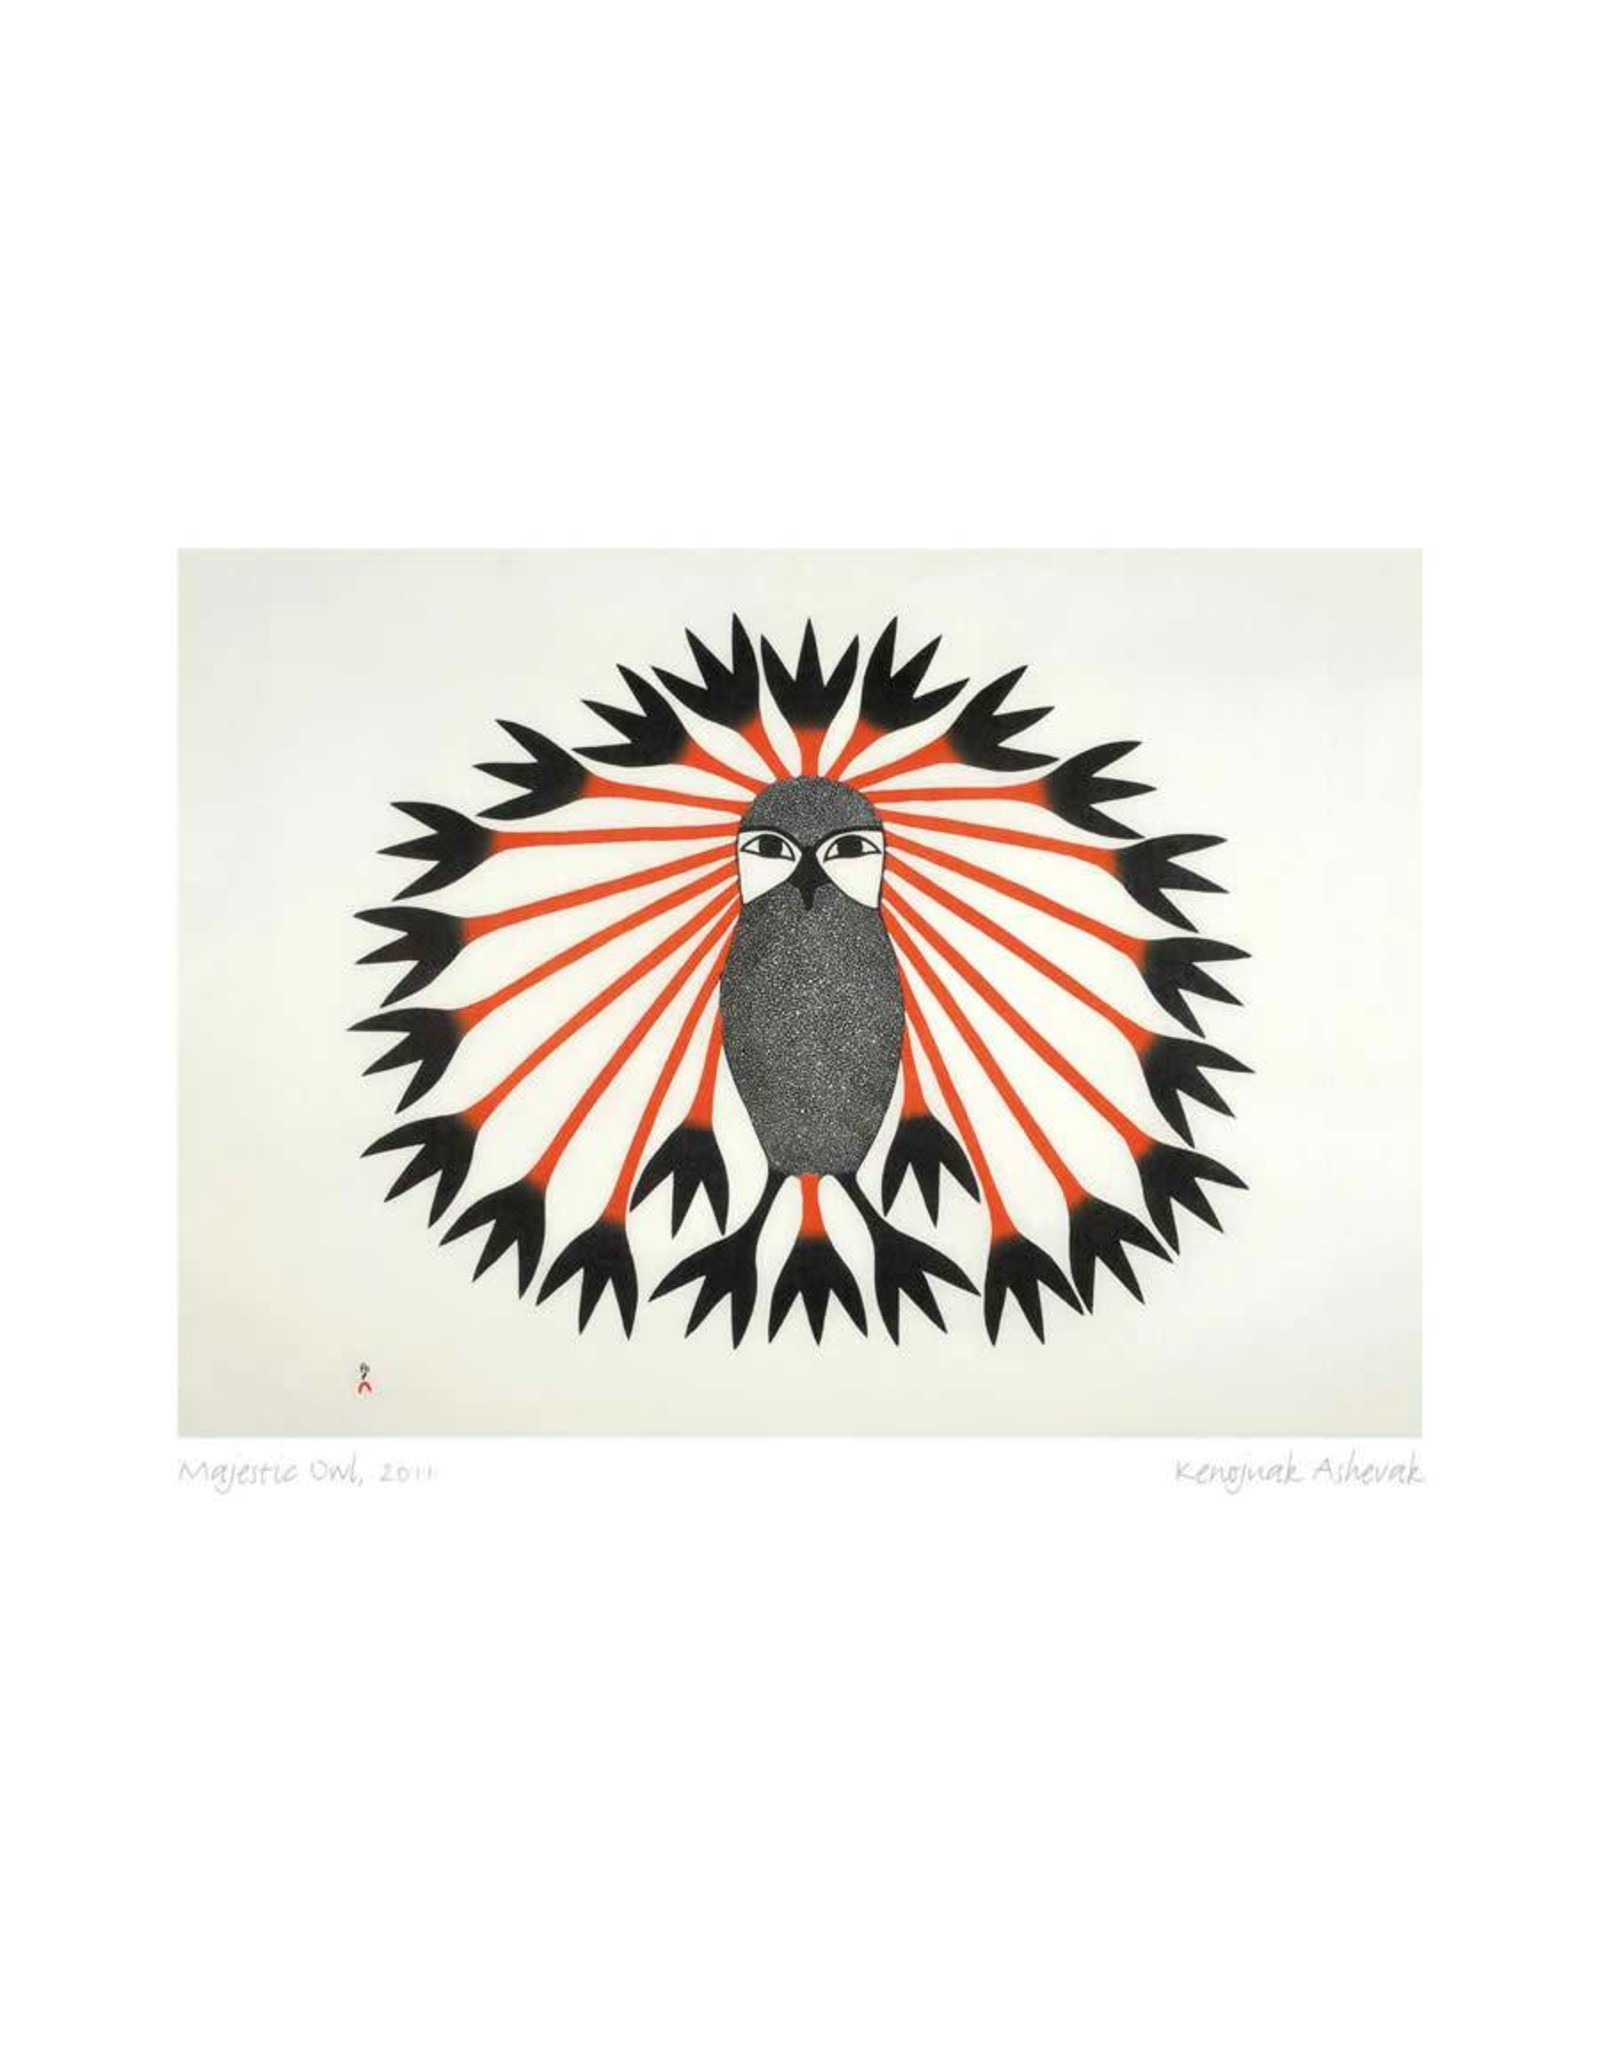 Majestic Owl, 2011 by Kenojuak Ashevak Matted